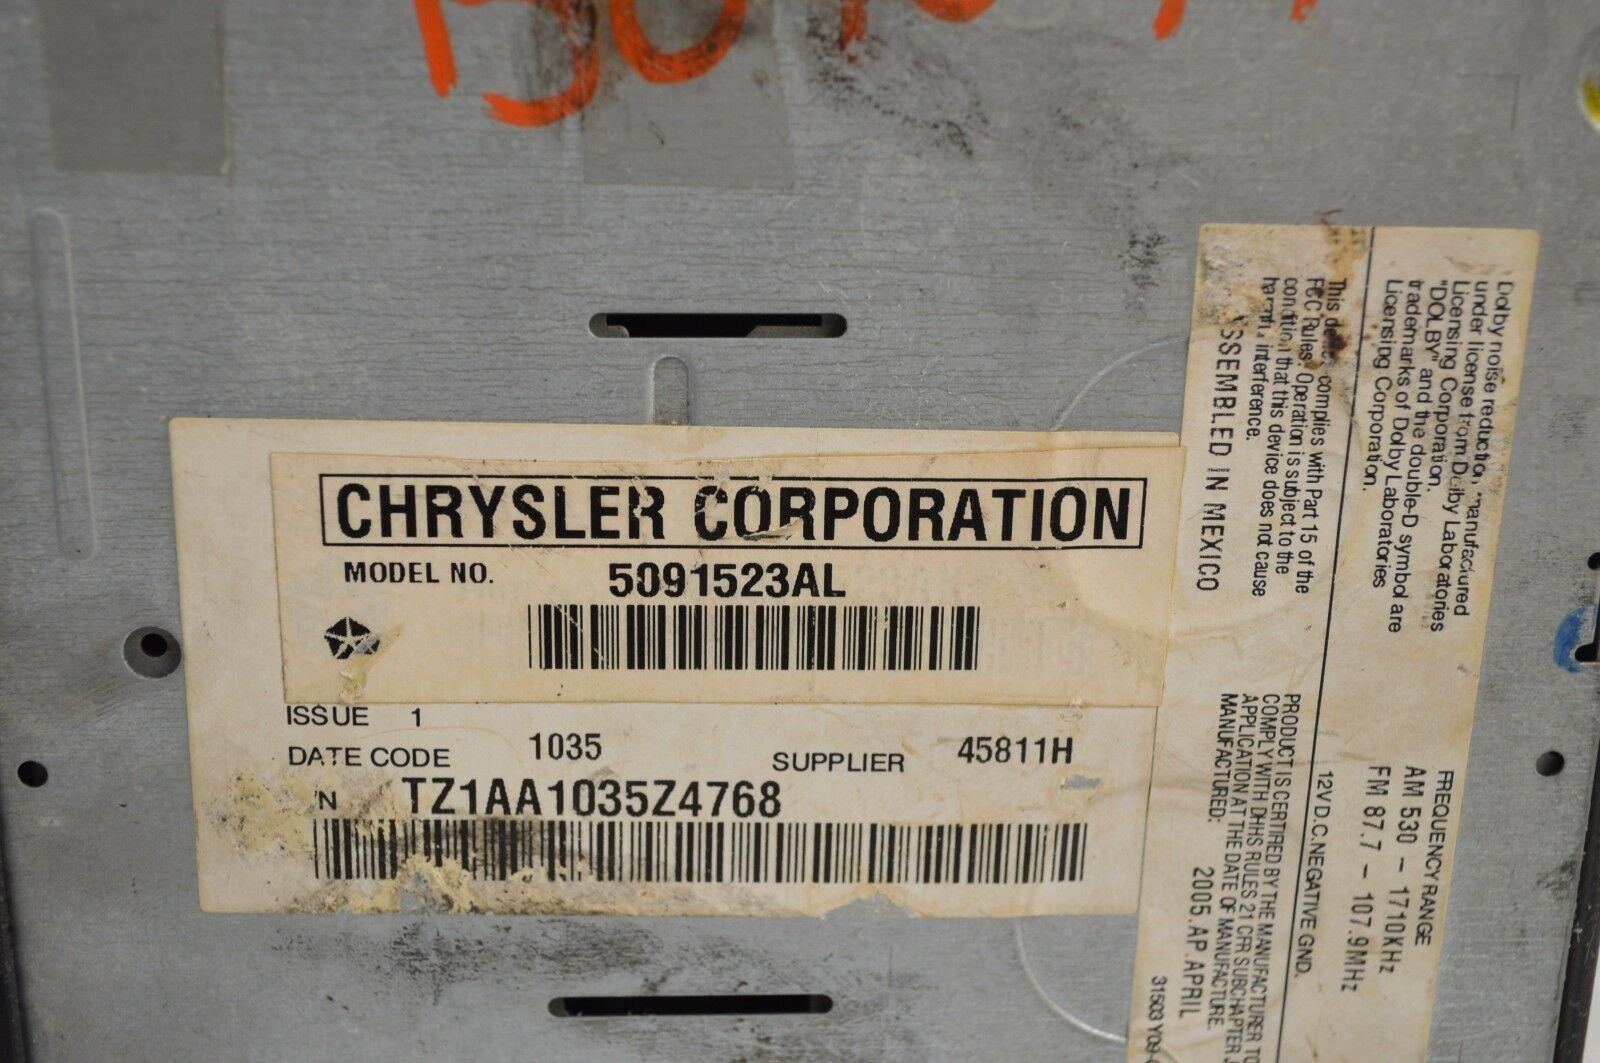 2005-2007 CHRYSLER DODGE RADIO 6 CD MP3 CASSETTE PLAYER TESTD 5091523AL AA36#016 image 5